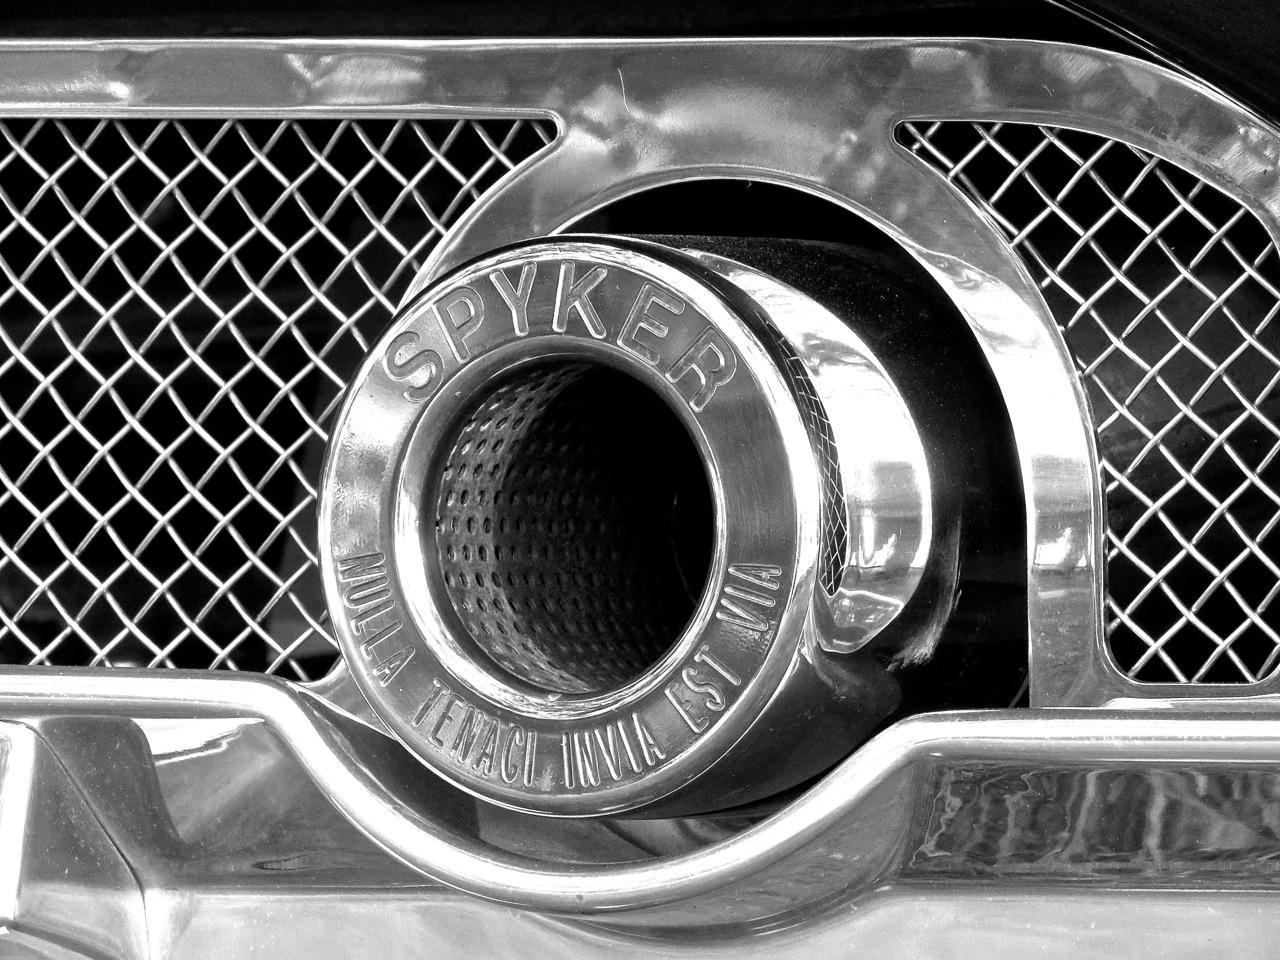 Spyker C8 LaViolette Misslewood 16